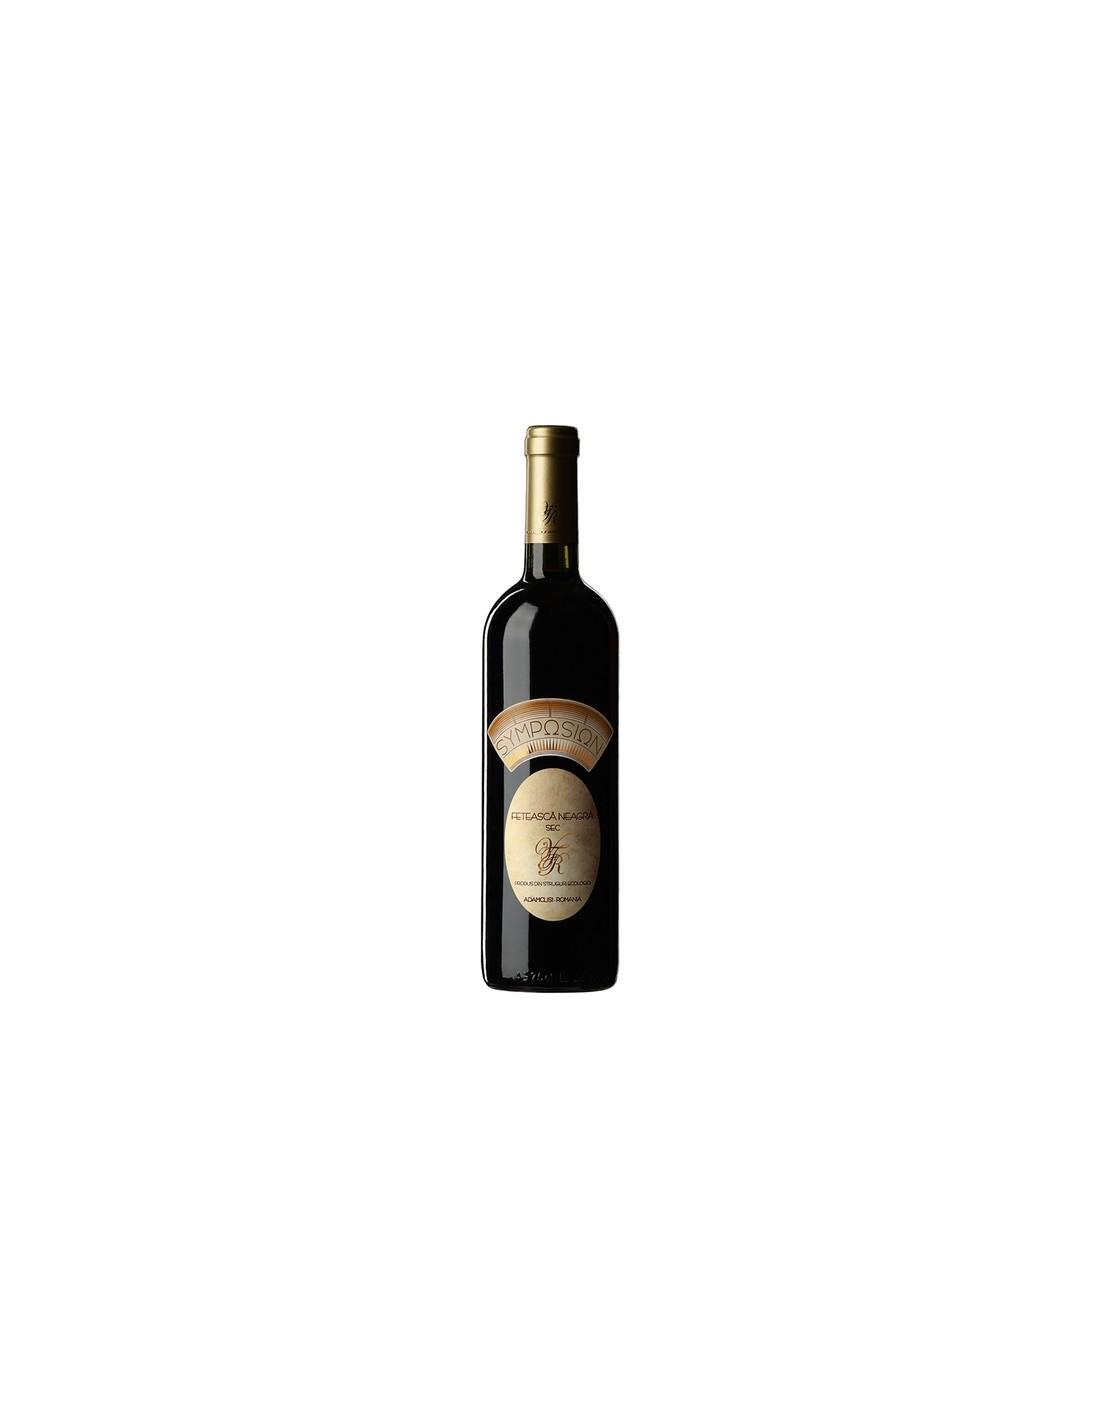 Vin rosu sec, Feteasca Neagra, Symposion Adamclisi, 0.75L, 13% alc., Romania